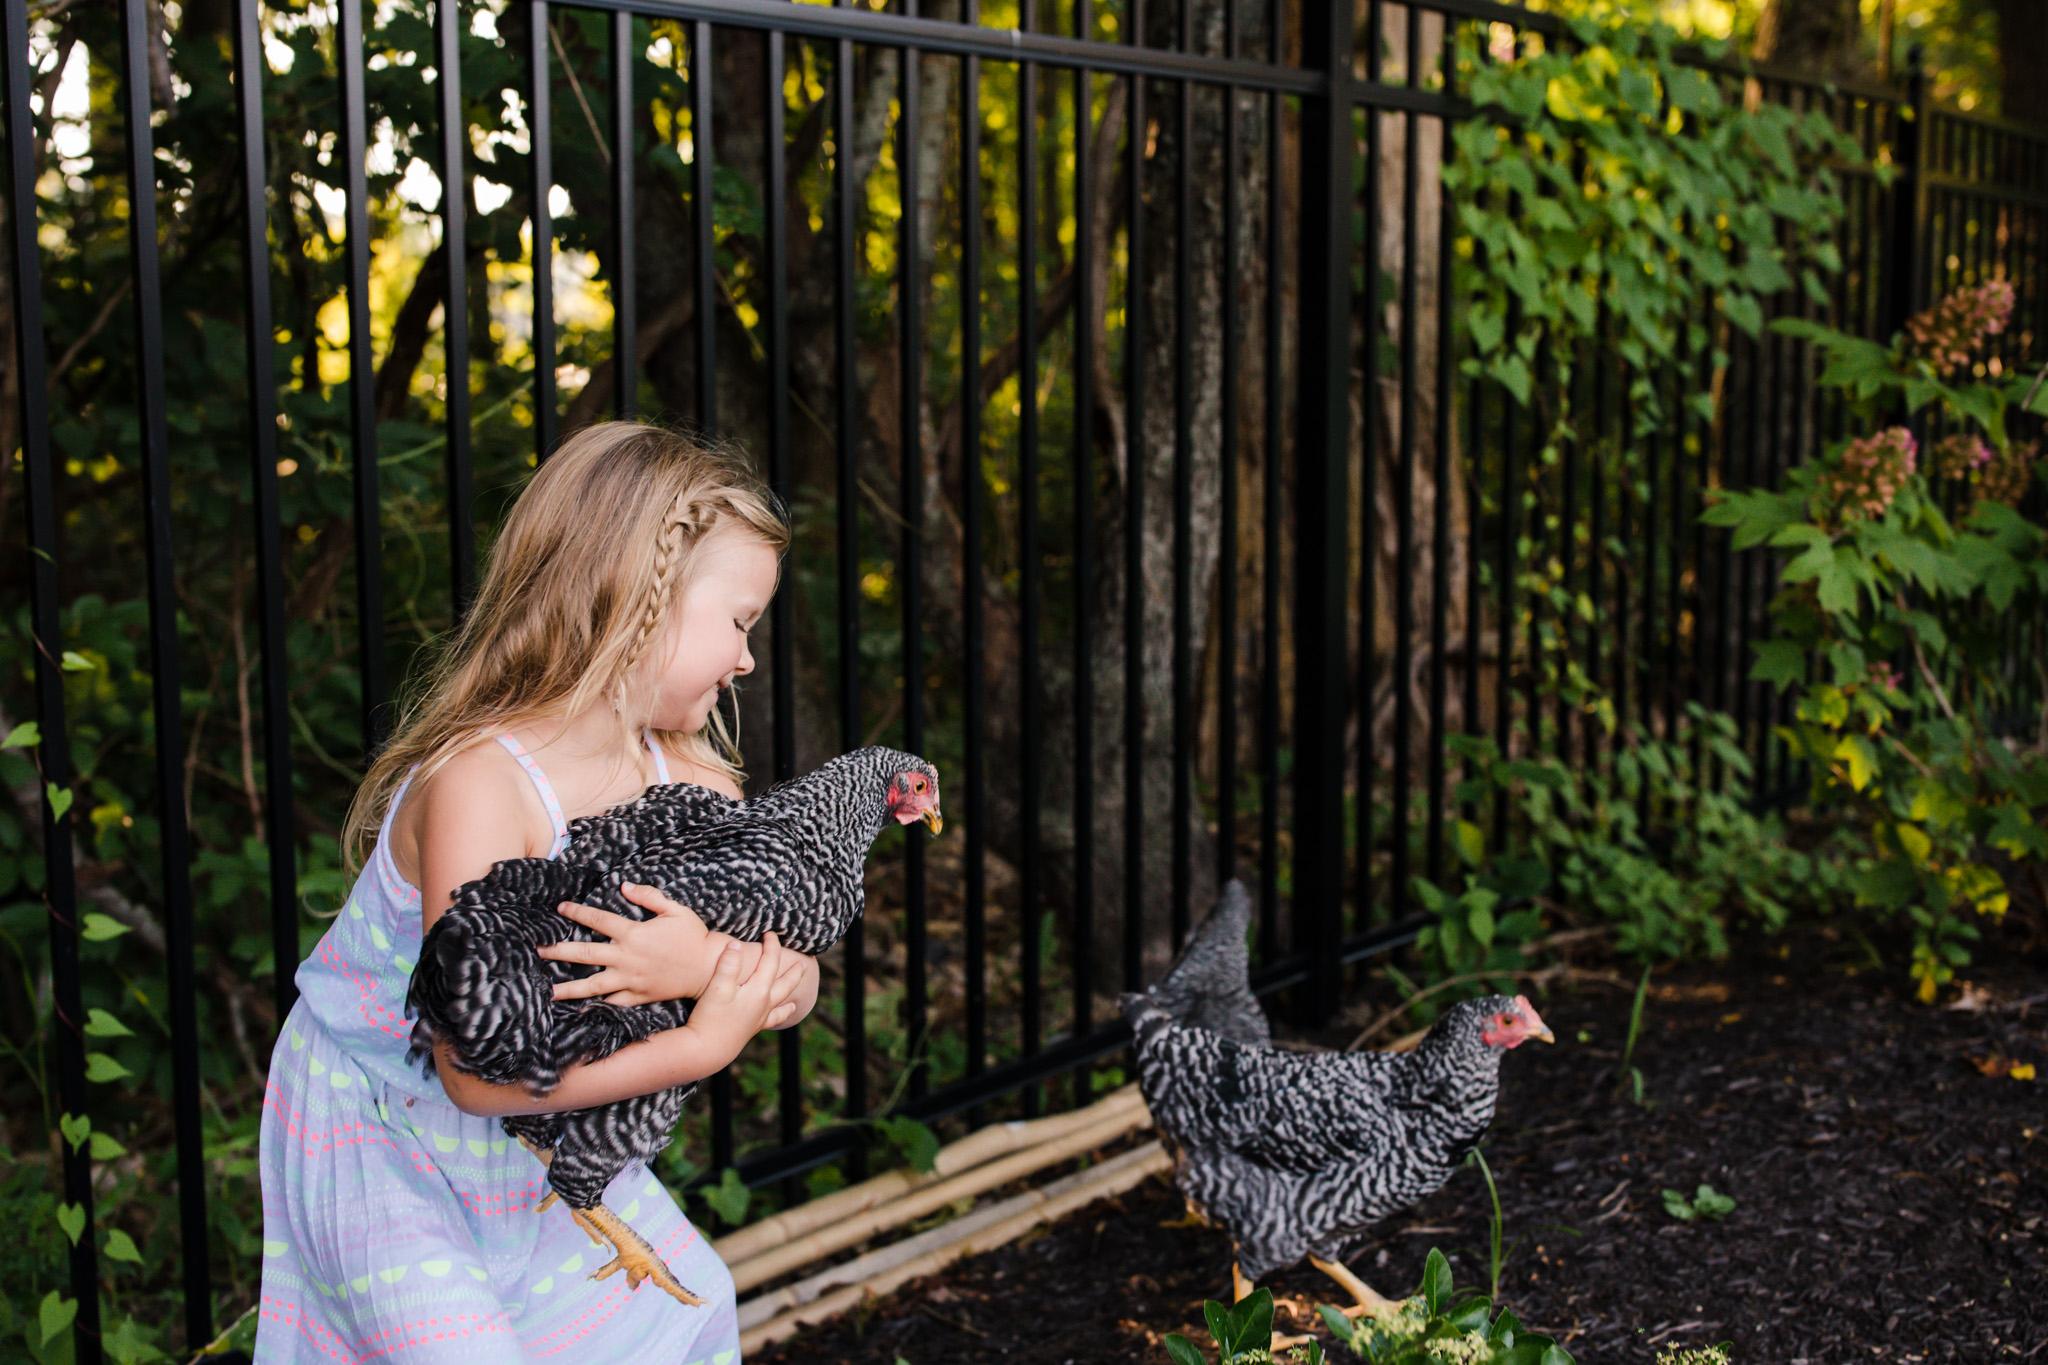 AnneMarie-Hamant-Lehigh Valley PA photographer-www.annemariehamant.com-27.jpg